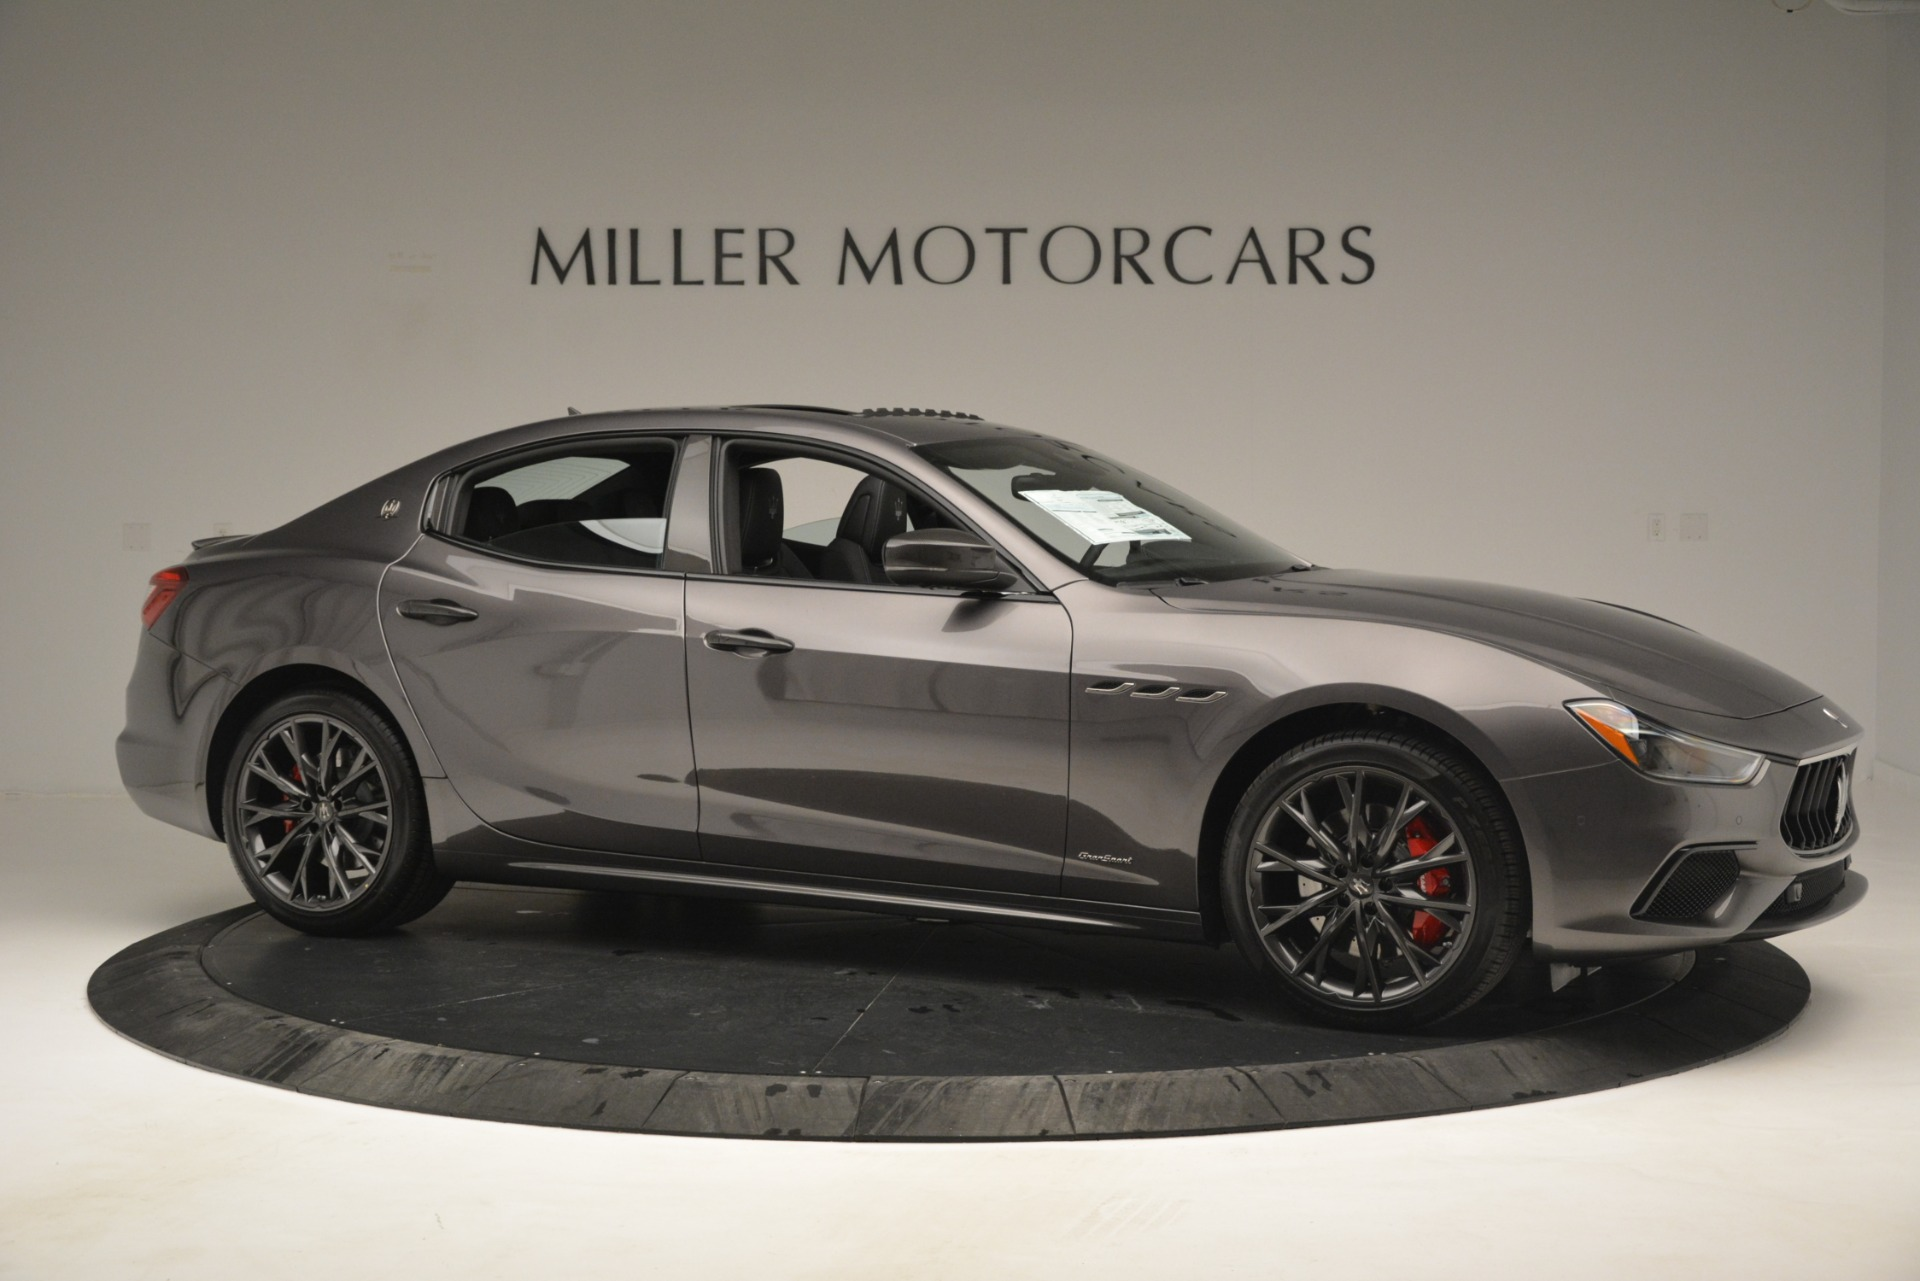 New 2019 Maserati Ghibli S Q4 GranSport For Sale In Westport, CT 2925_p11